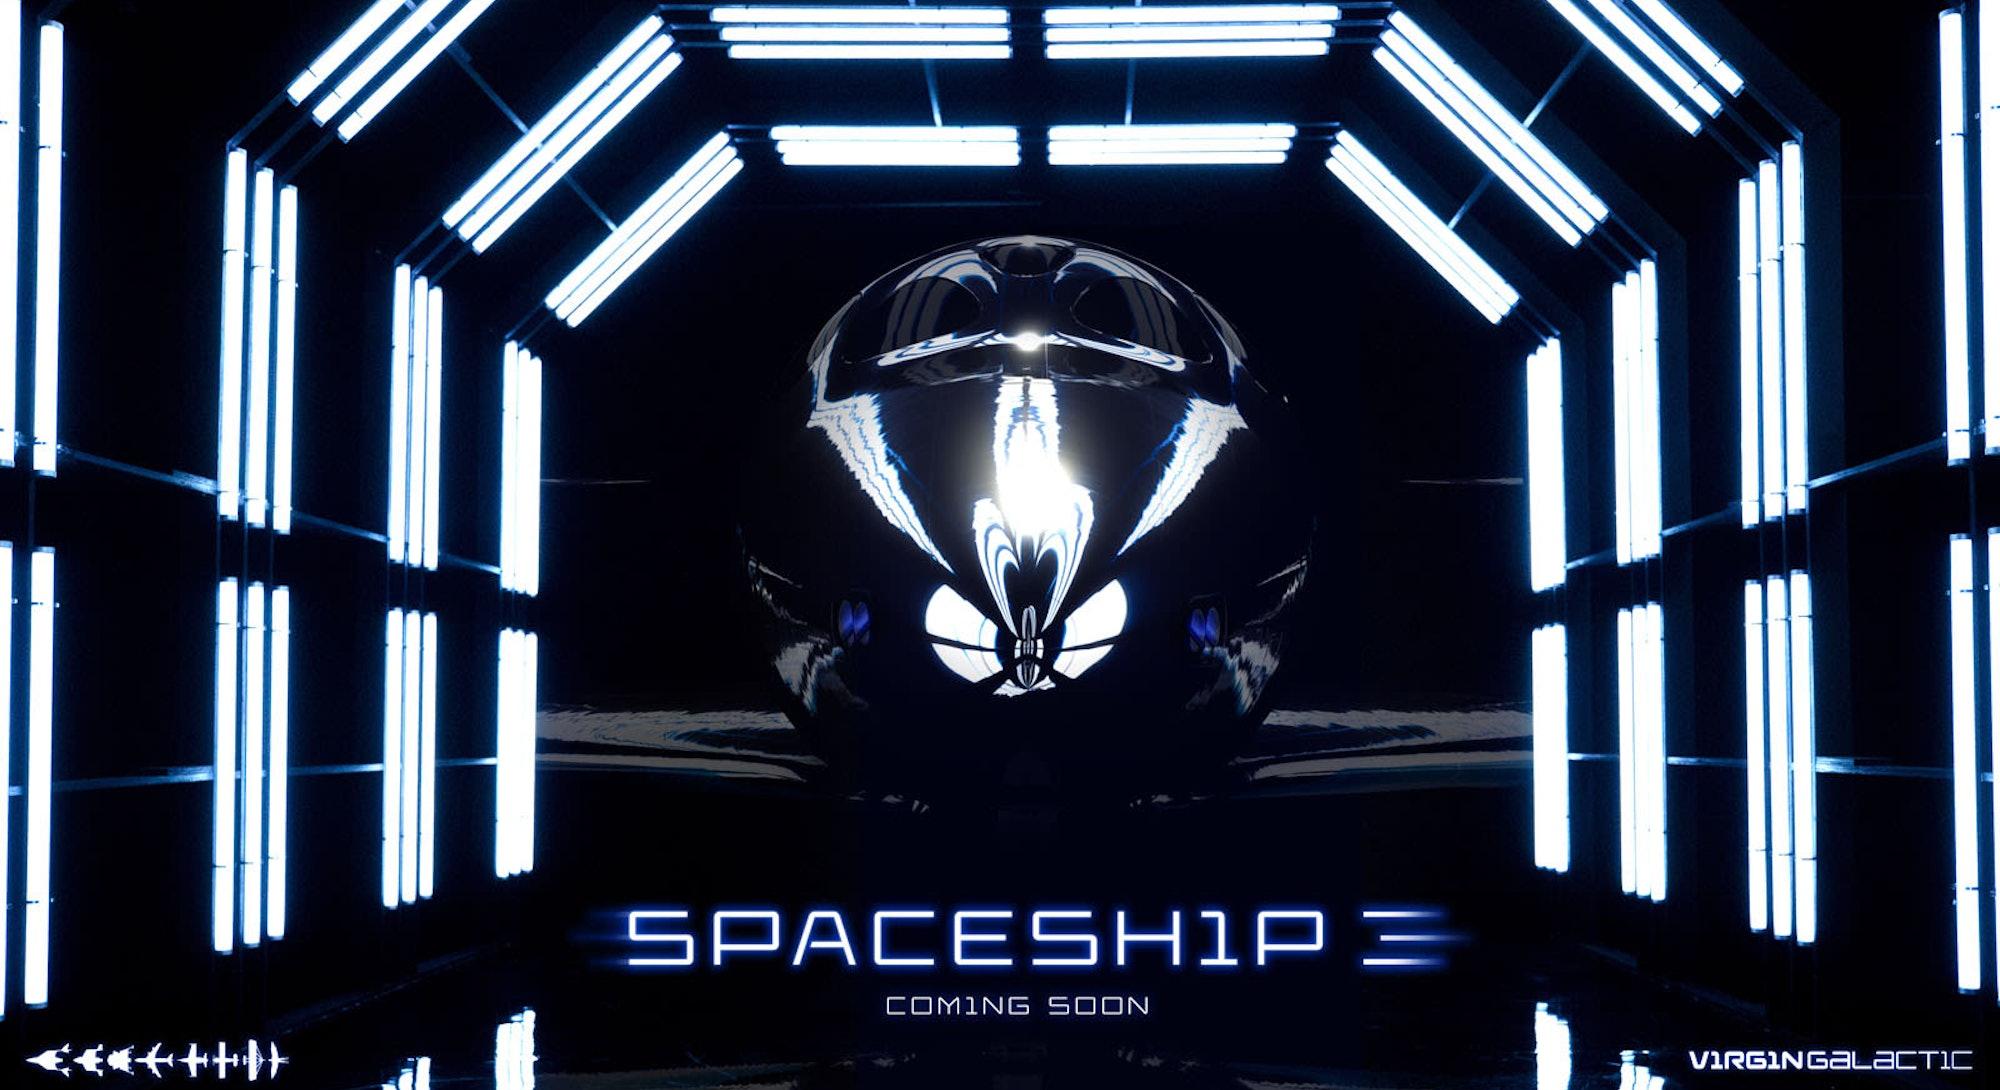 Virgin Galactic Spaceship 3 poster